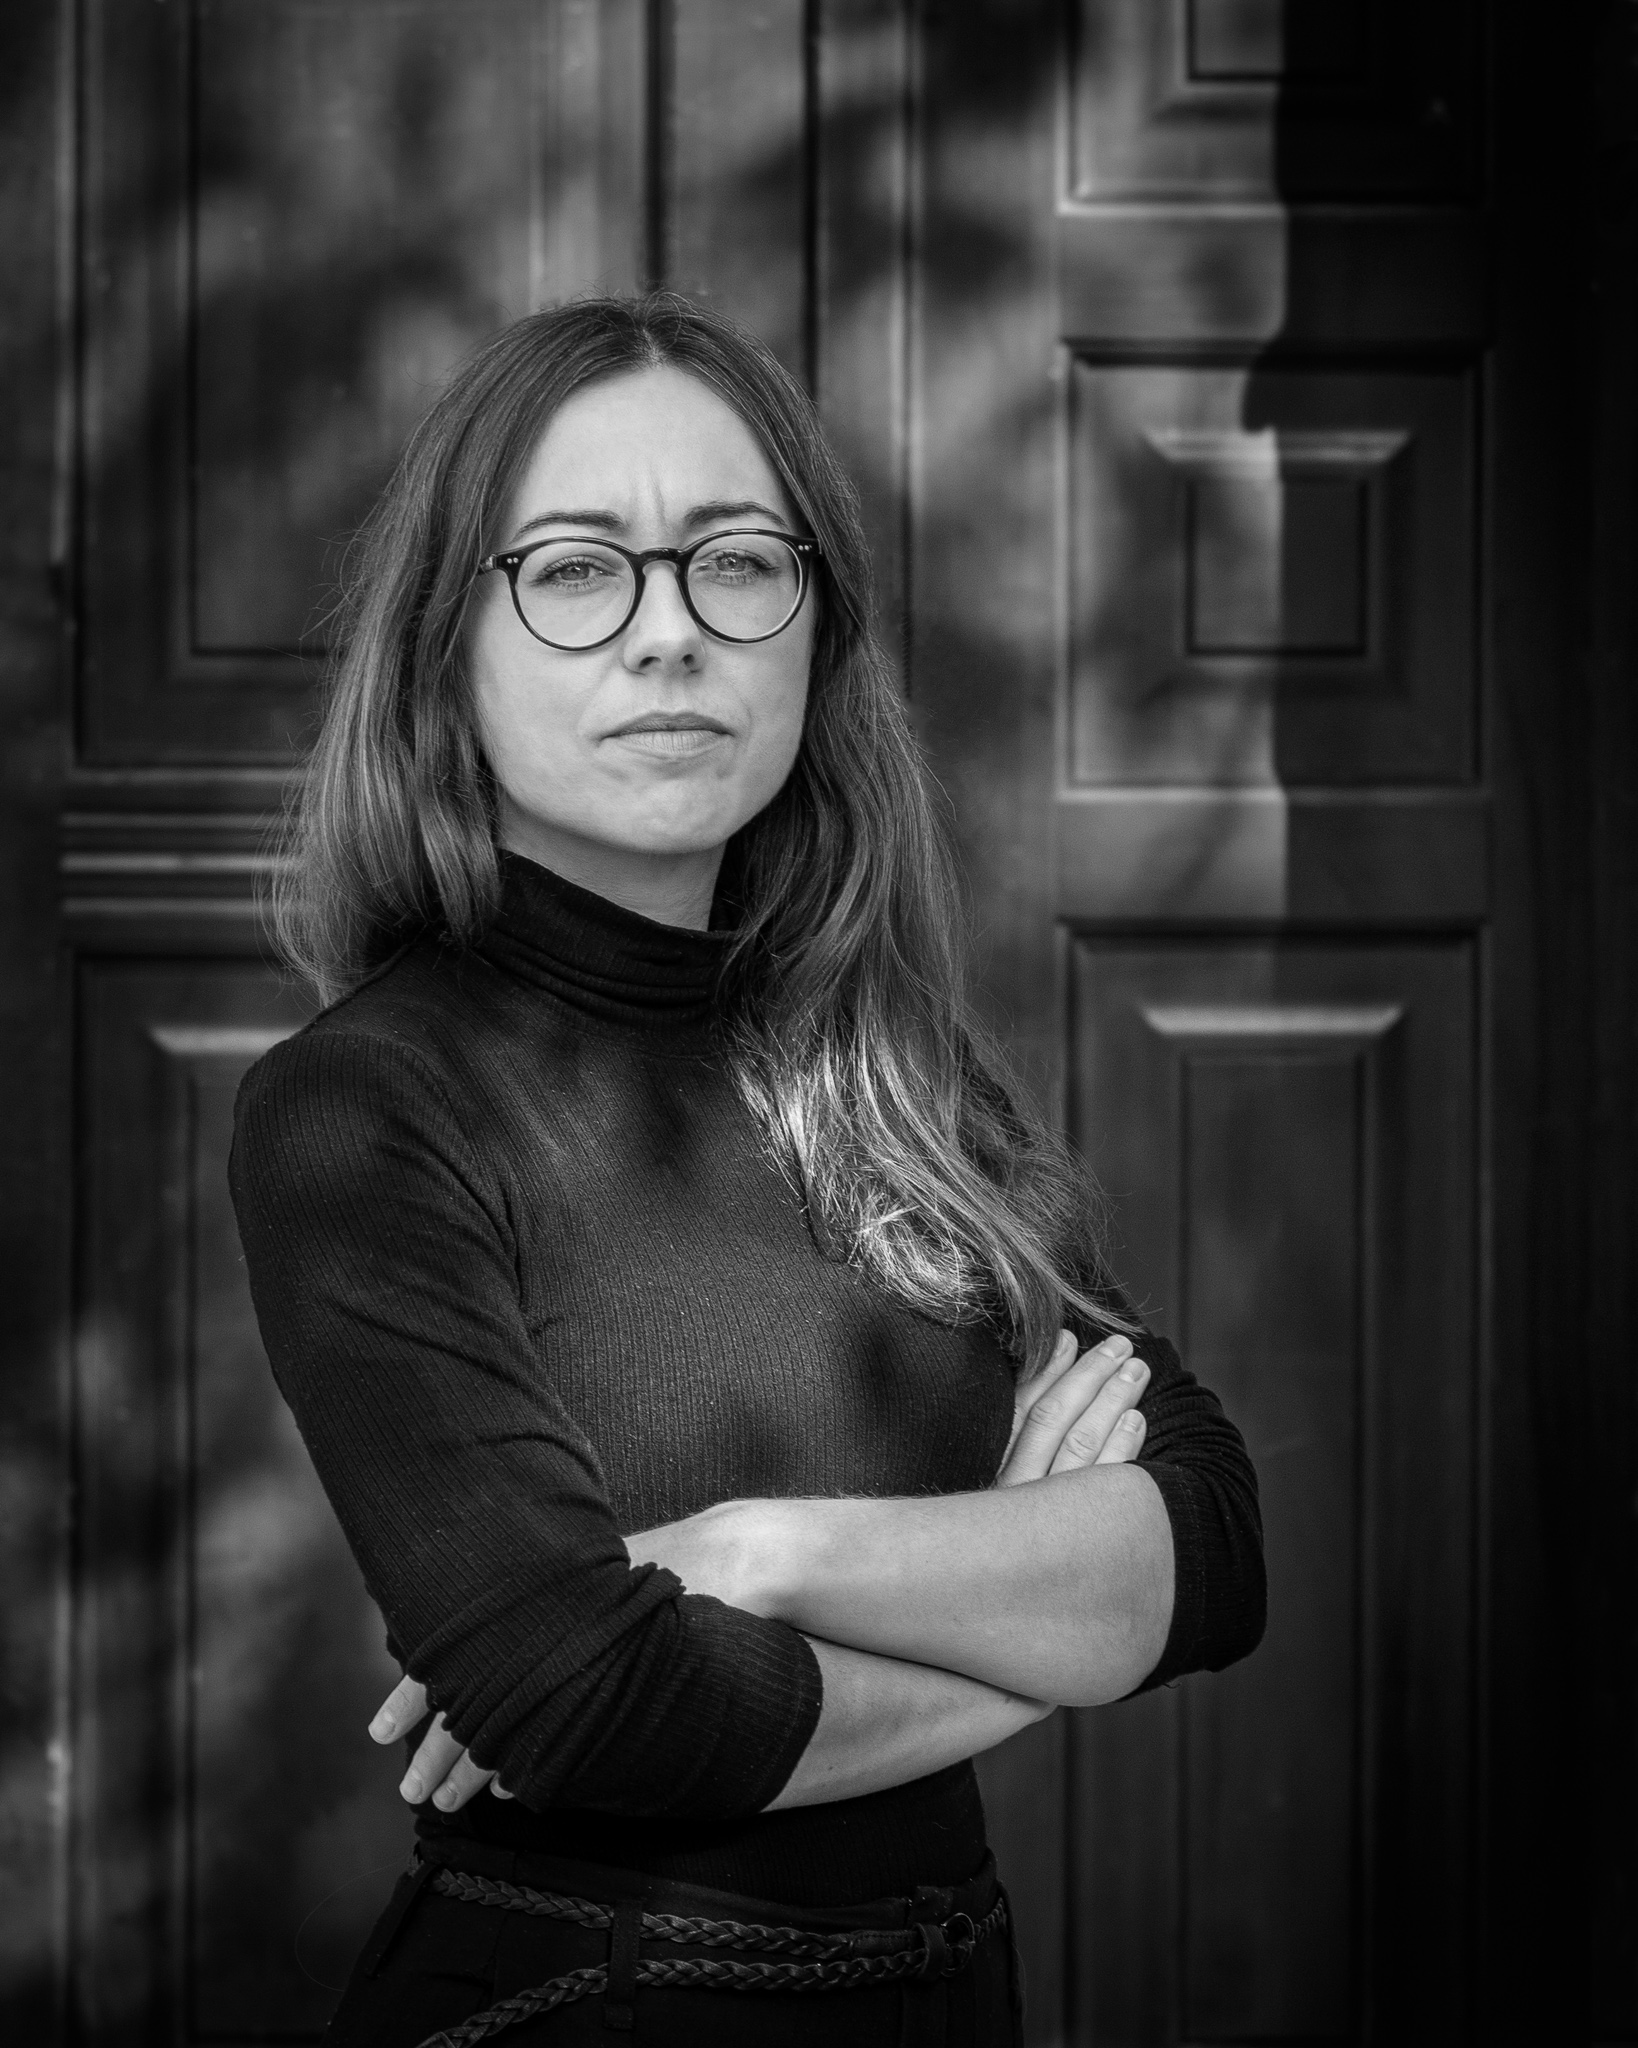 Aleksandra - Centrum Praw Kobiet